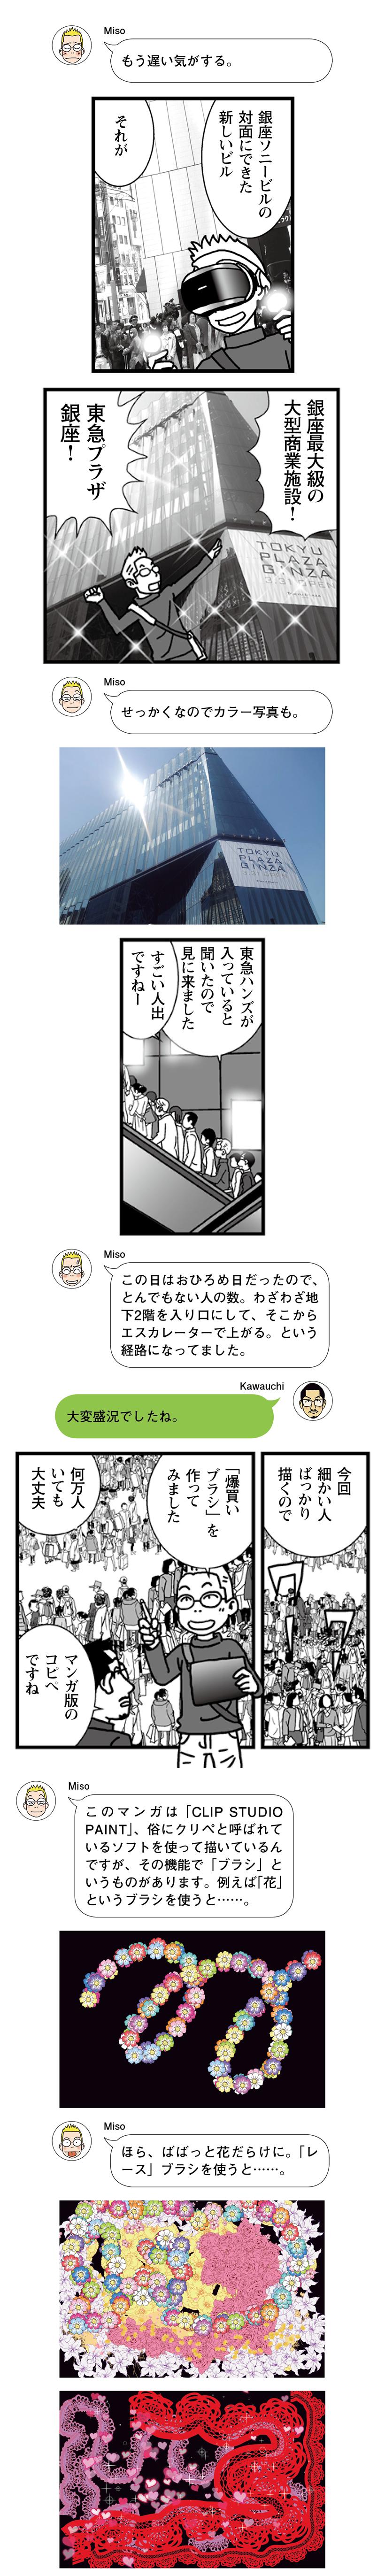 20160511_02